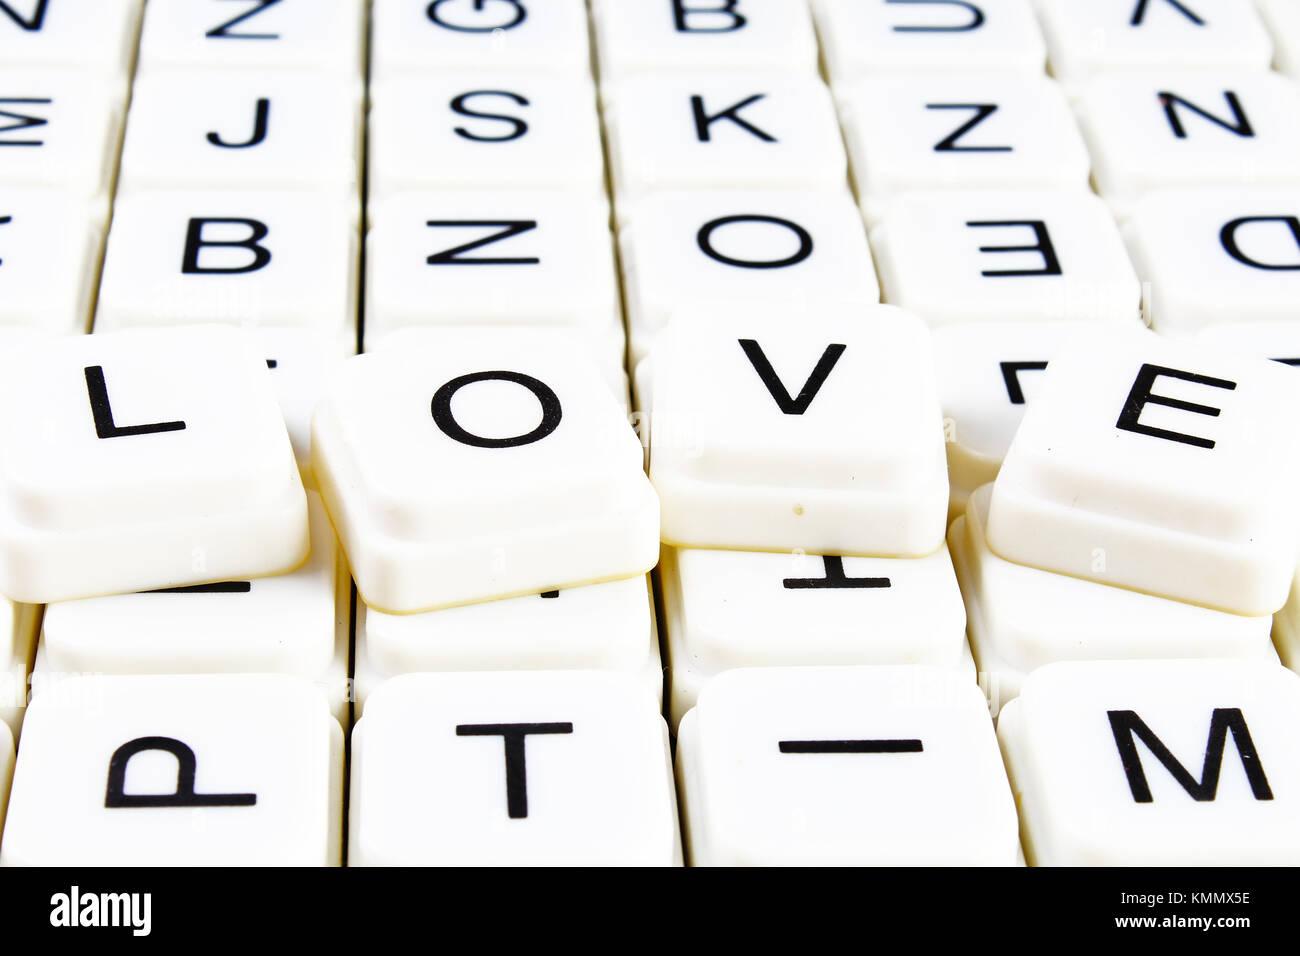 Lovele Text Word Crossword Alphabet Letter Blocks Game Texture Background White Alphabetical Letters On Black Background White Educational Toy Block